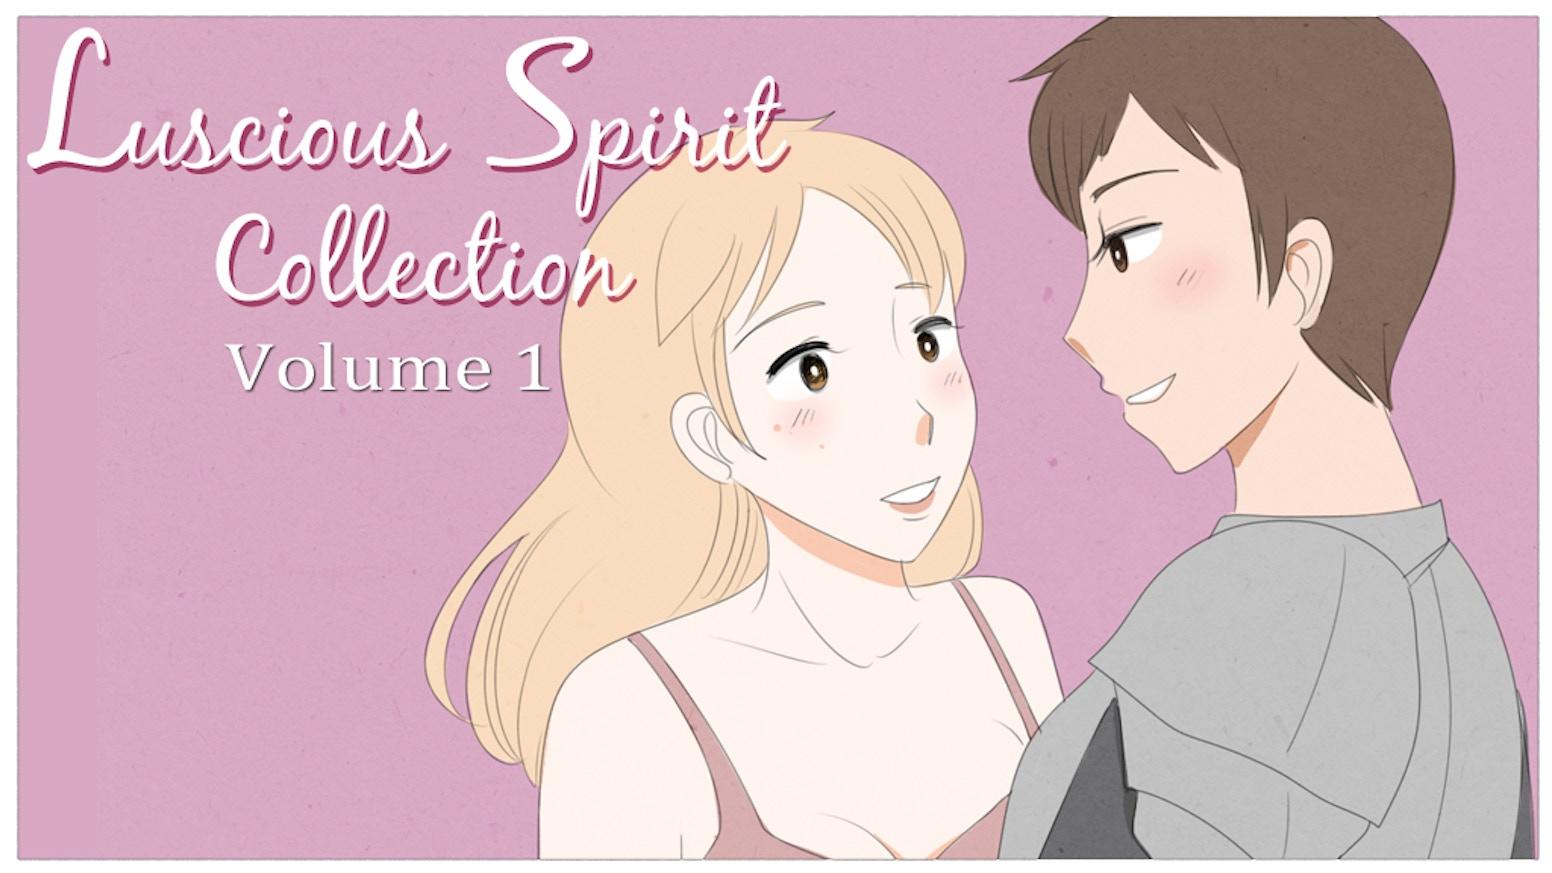 Anime Cute Lesbians lesbian romance short stories - luscious collection volume 1